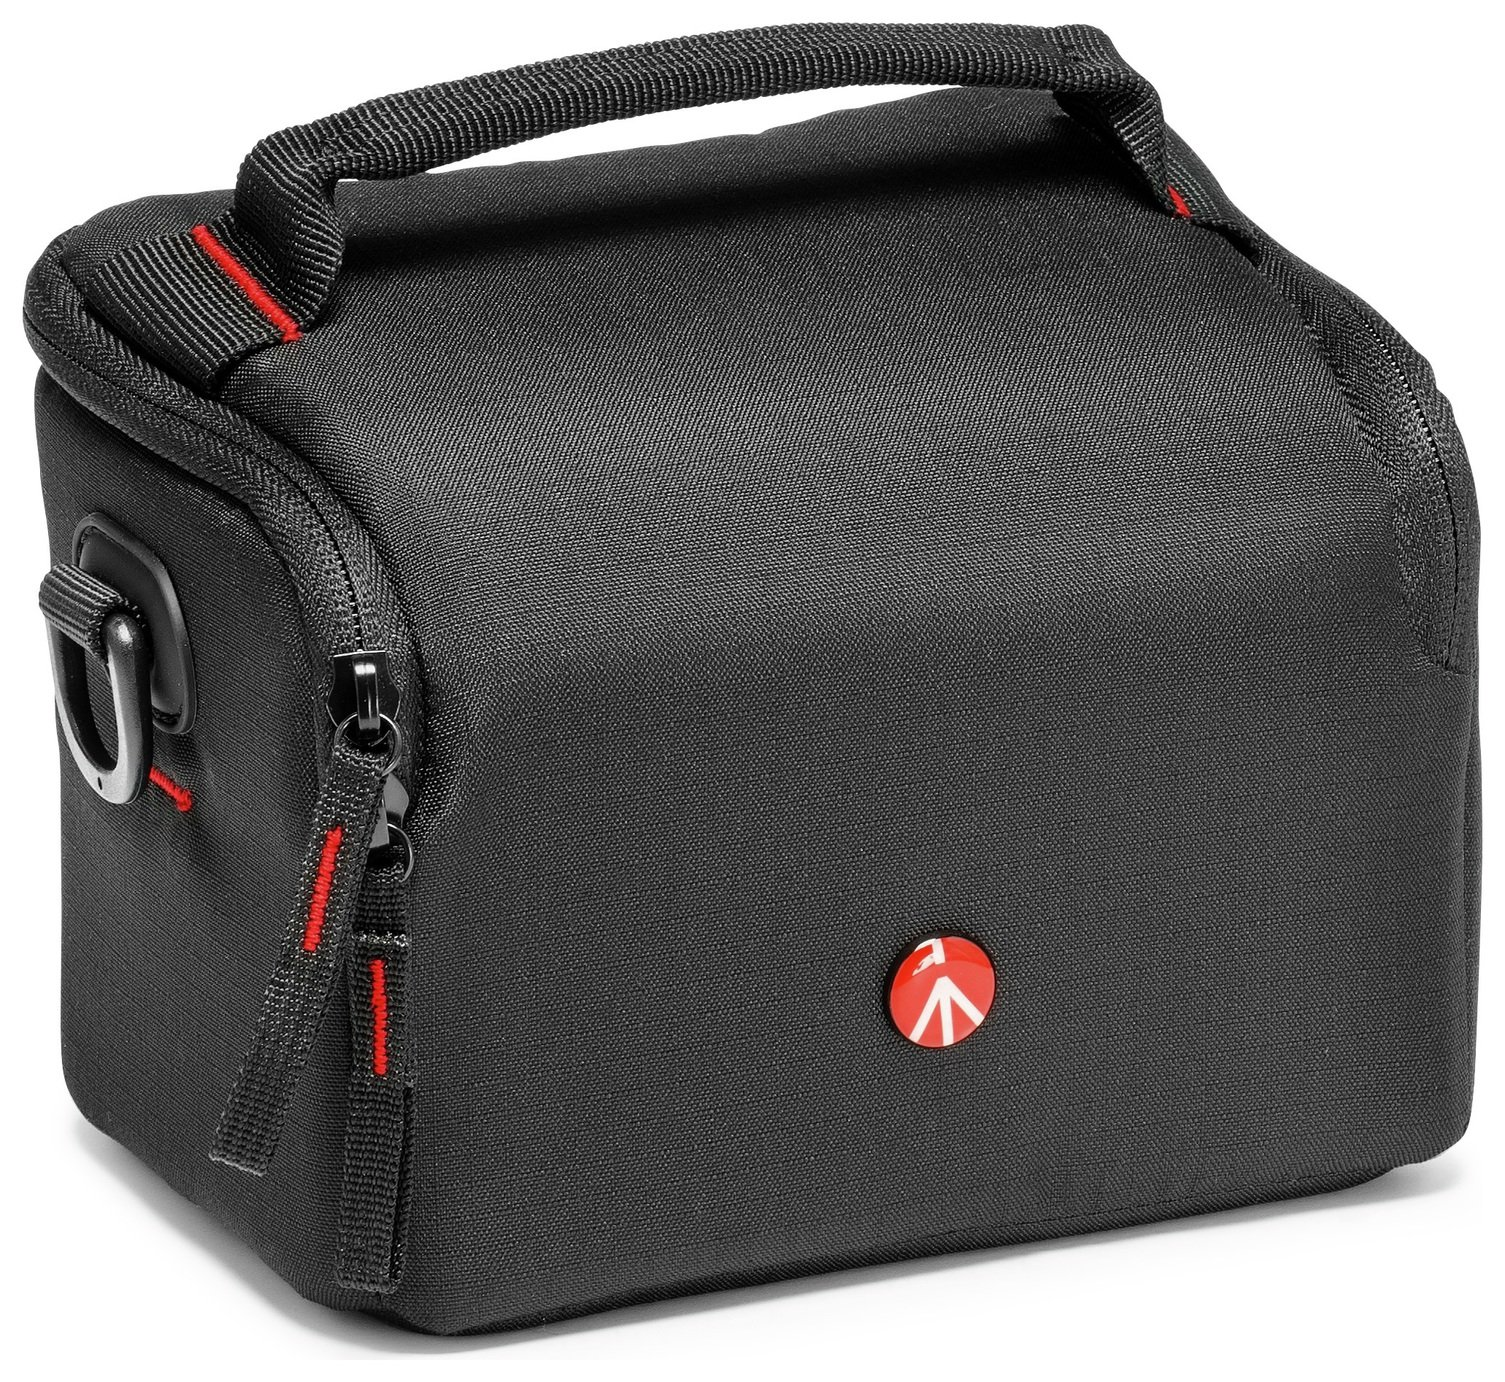 Manfrotto Essential Shoulder Compact Camera Bag review